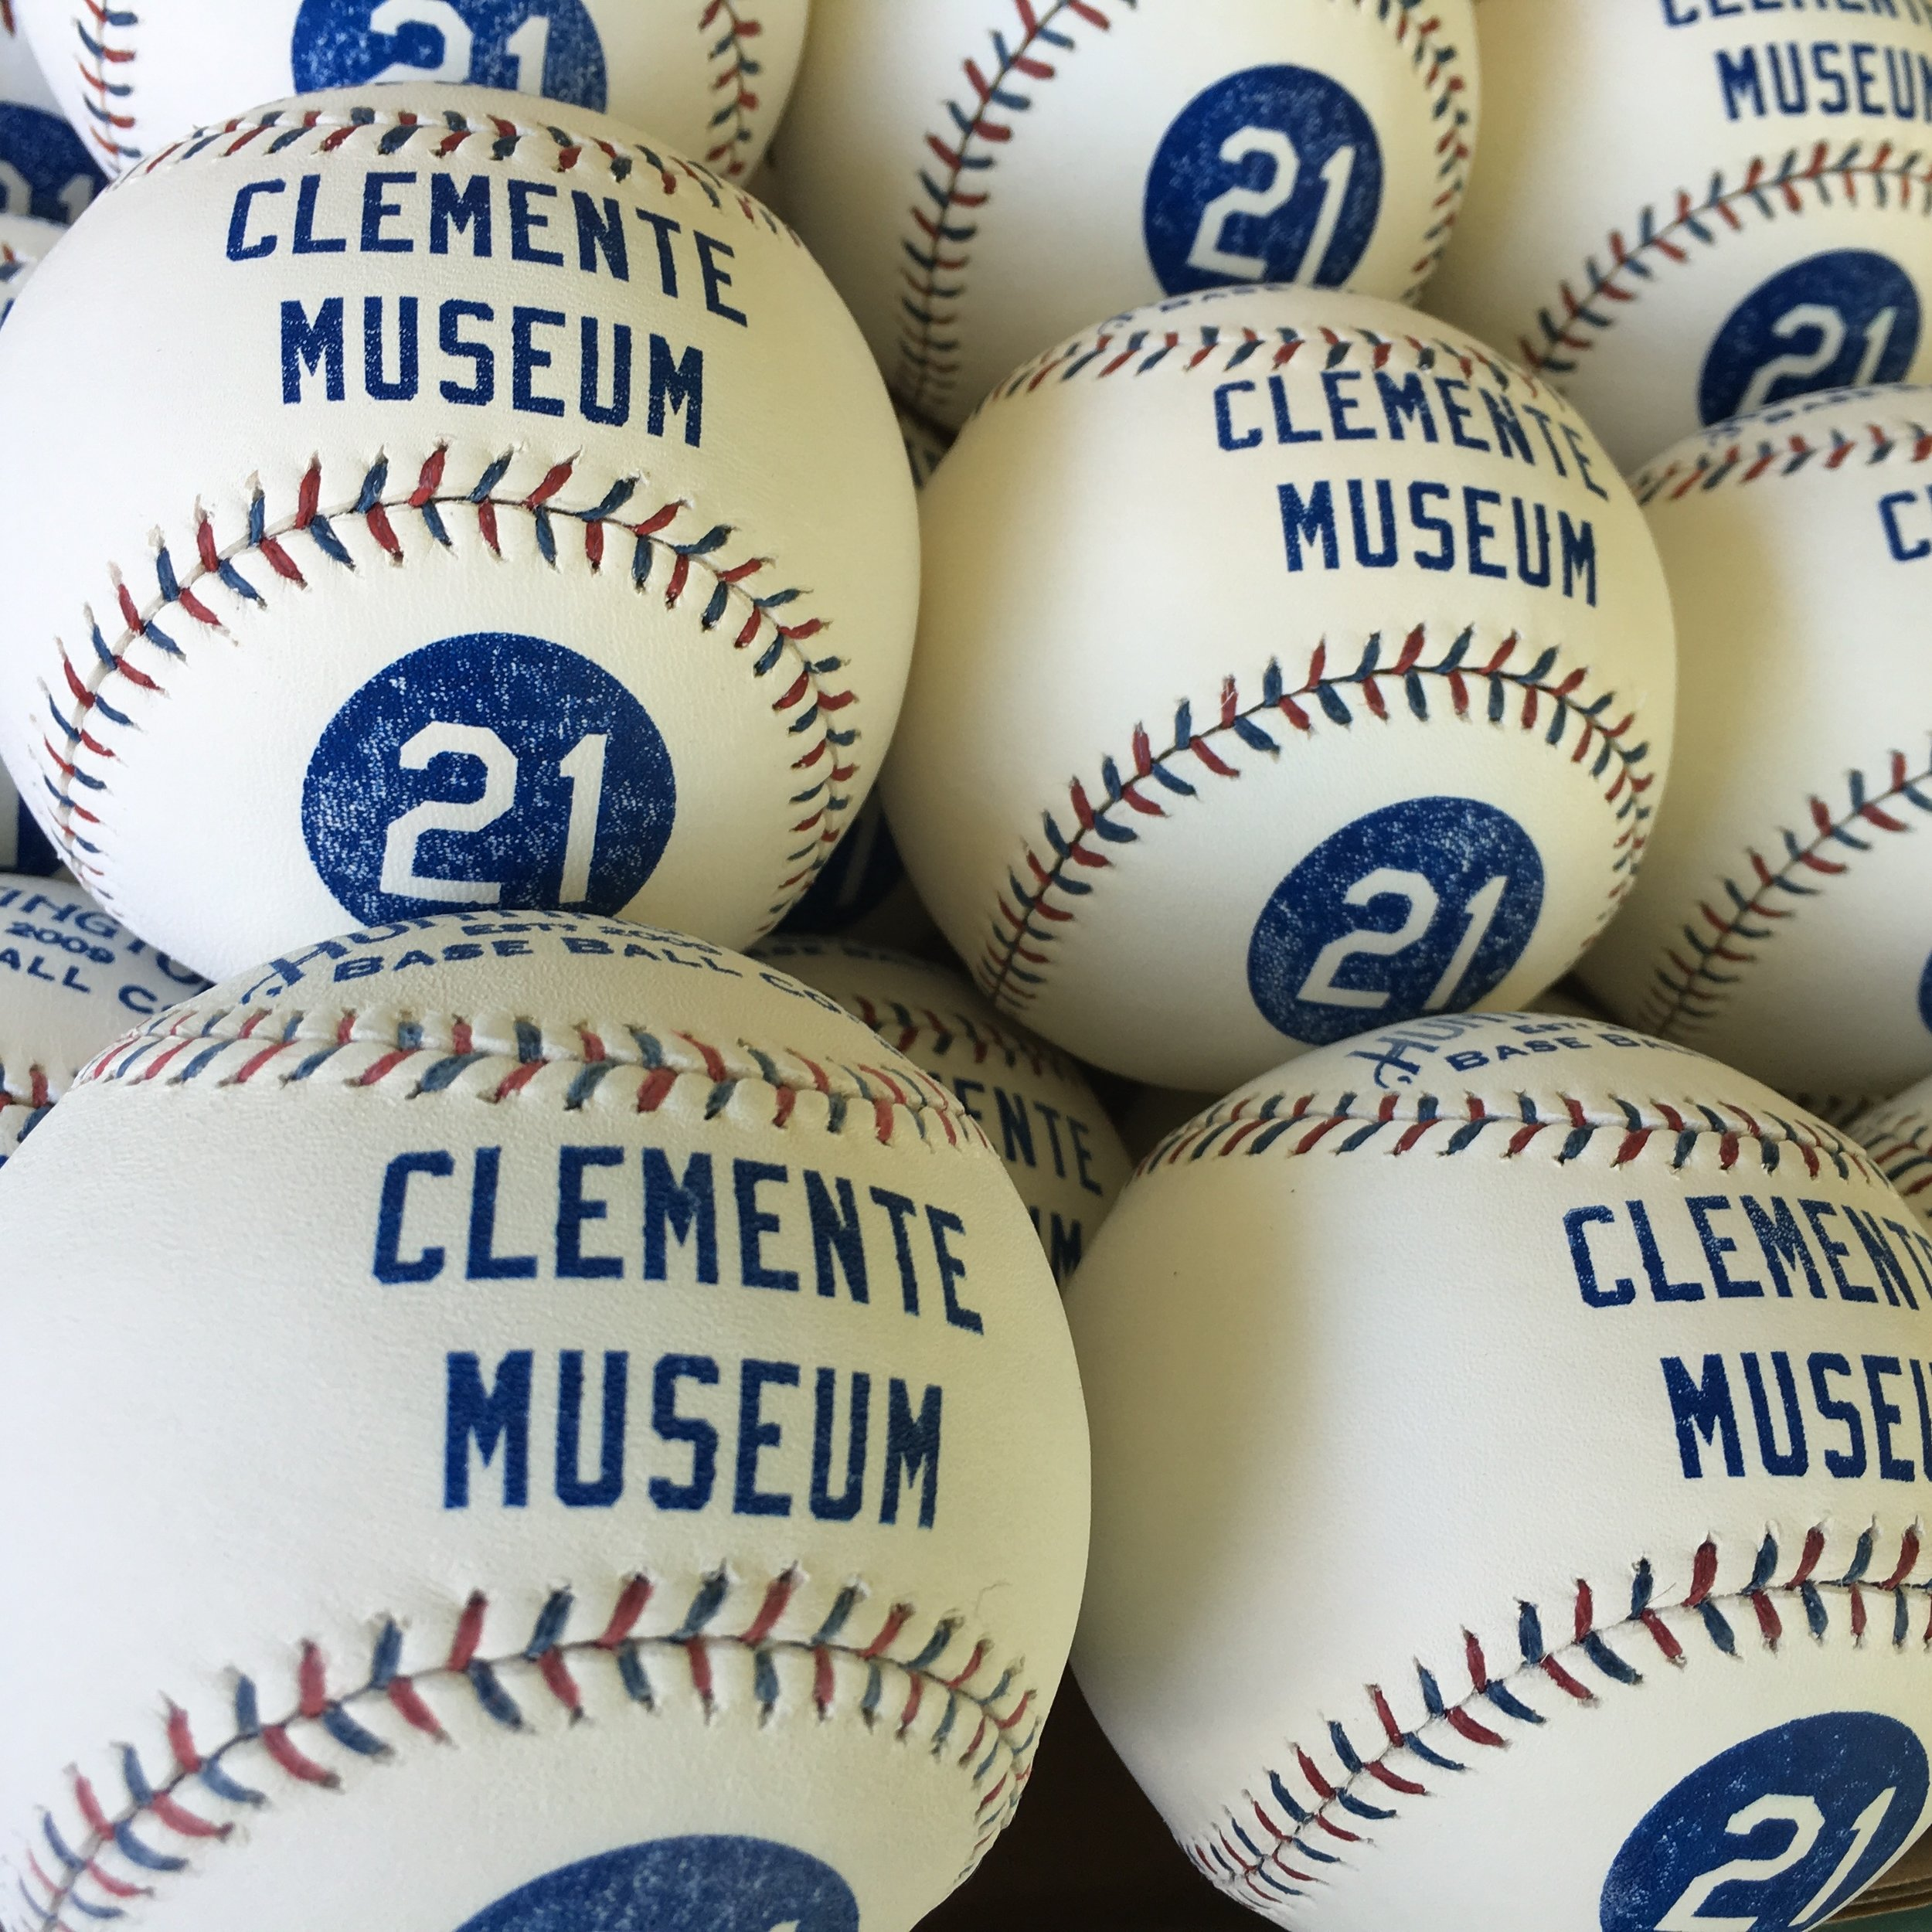 ClementeMuseum.jpg